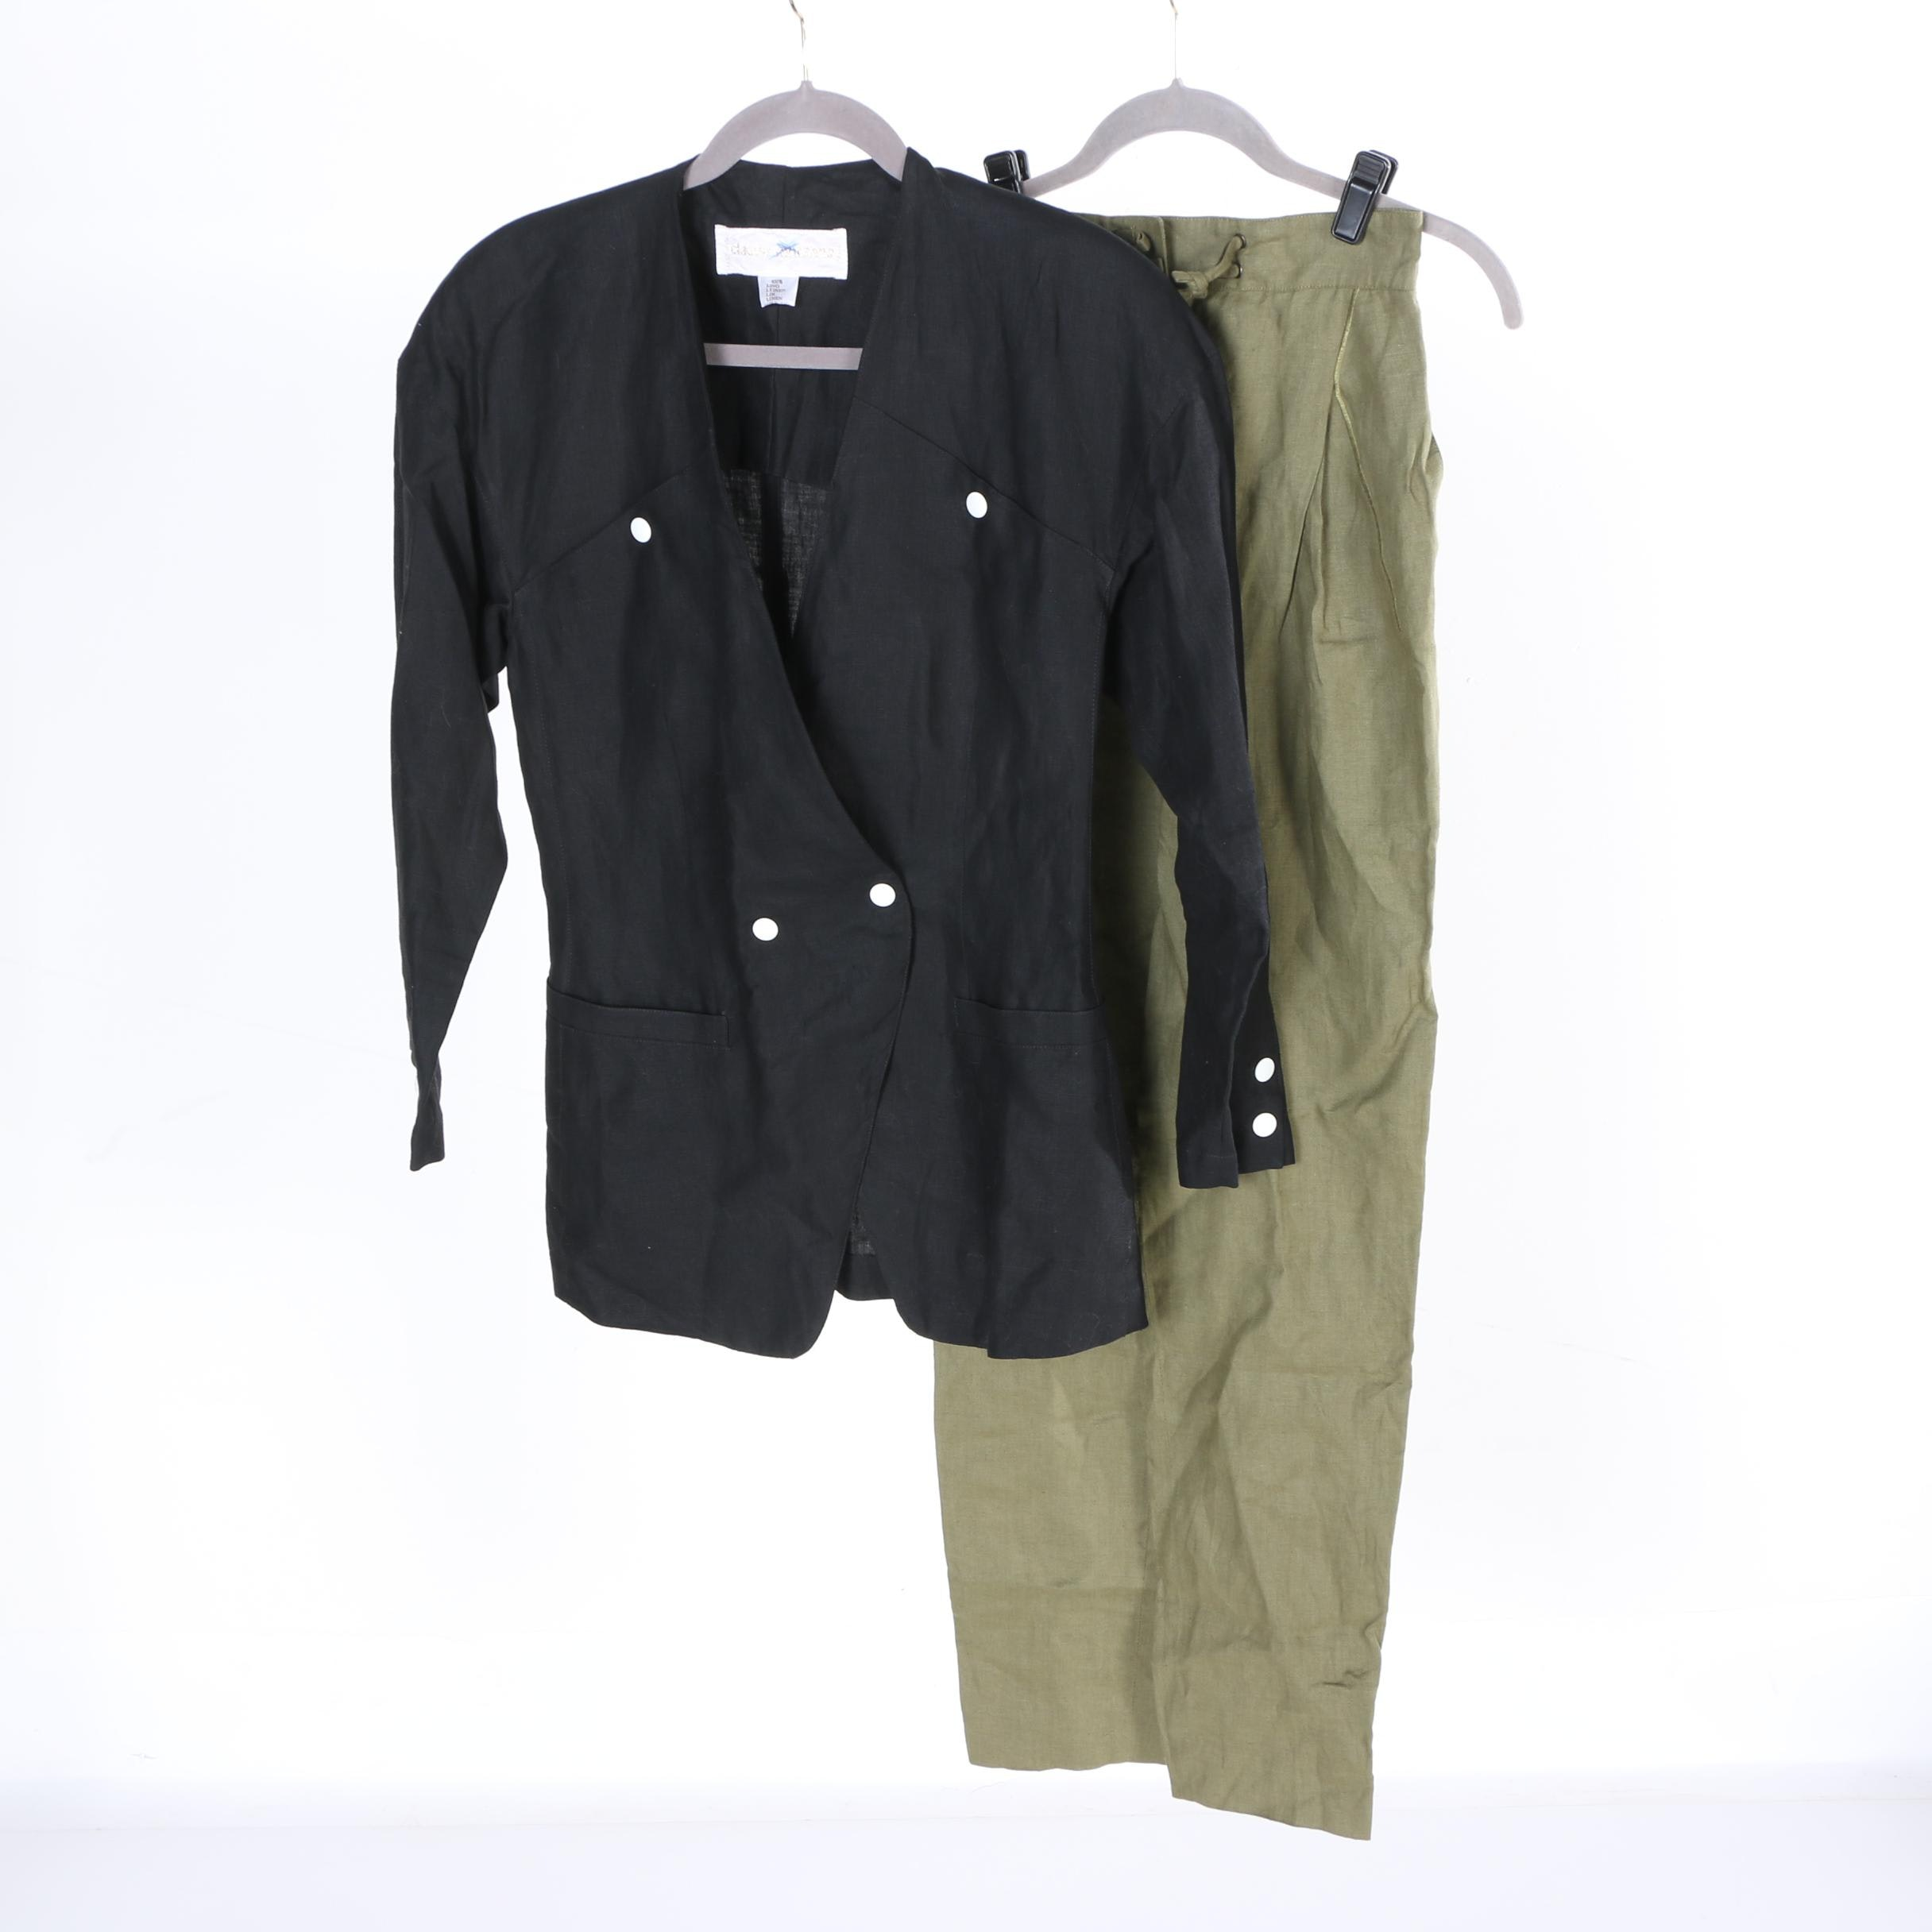 Women's Claude Montana Linen Jacket and Pants